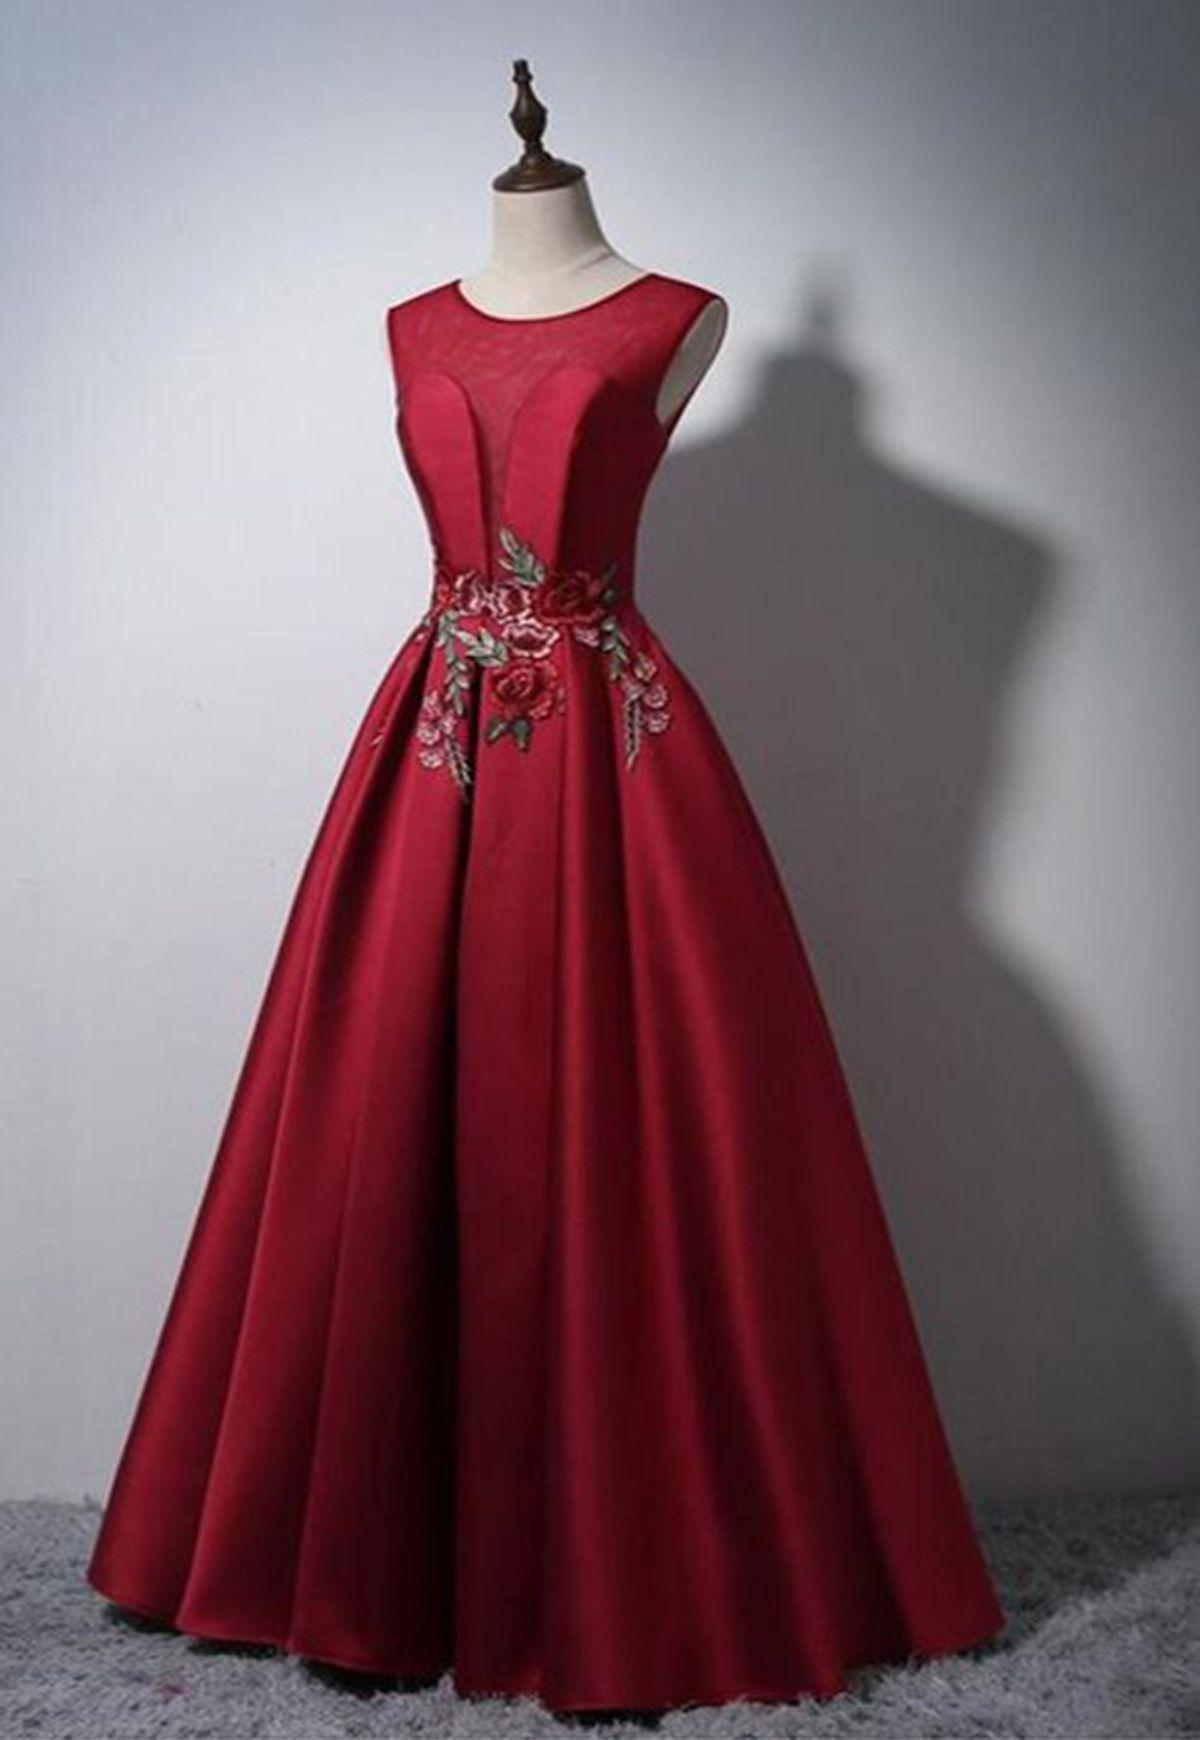 Red satin scoop neck long aline senior prom dress with flower